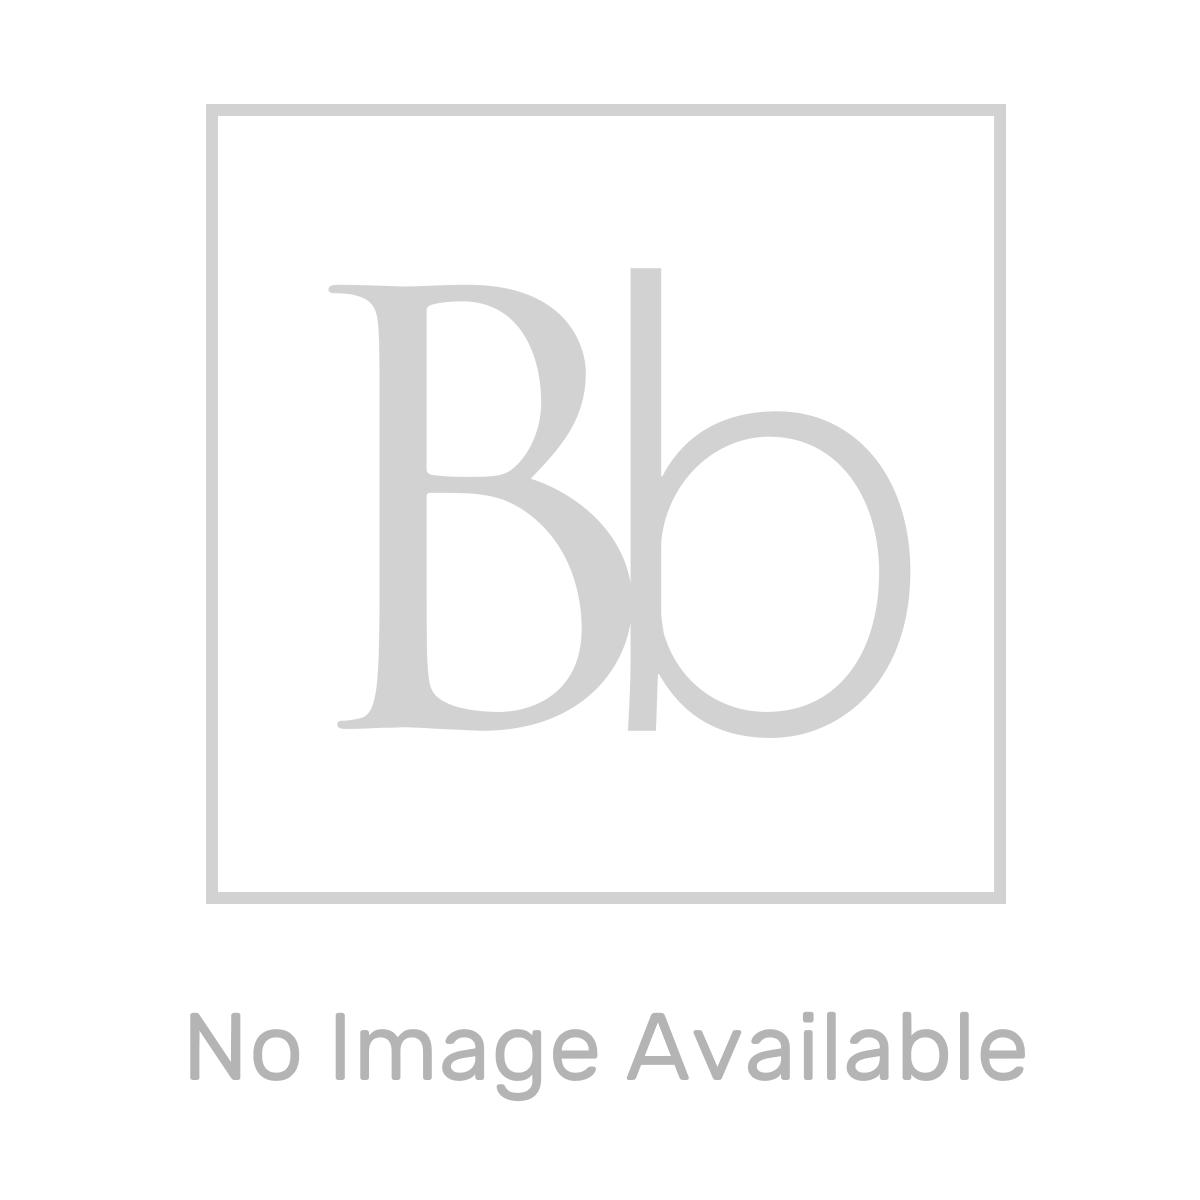 RAK Curve Chrome Mono Basin Mixer Tap with Waste Measurements